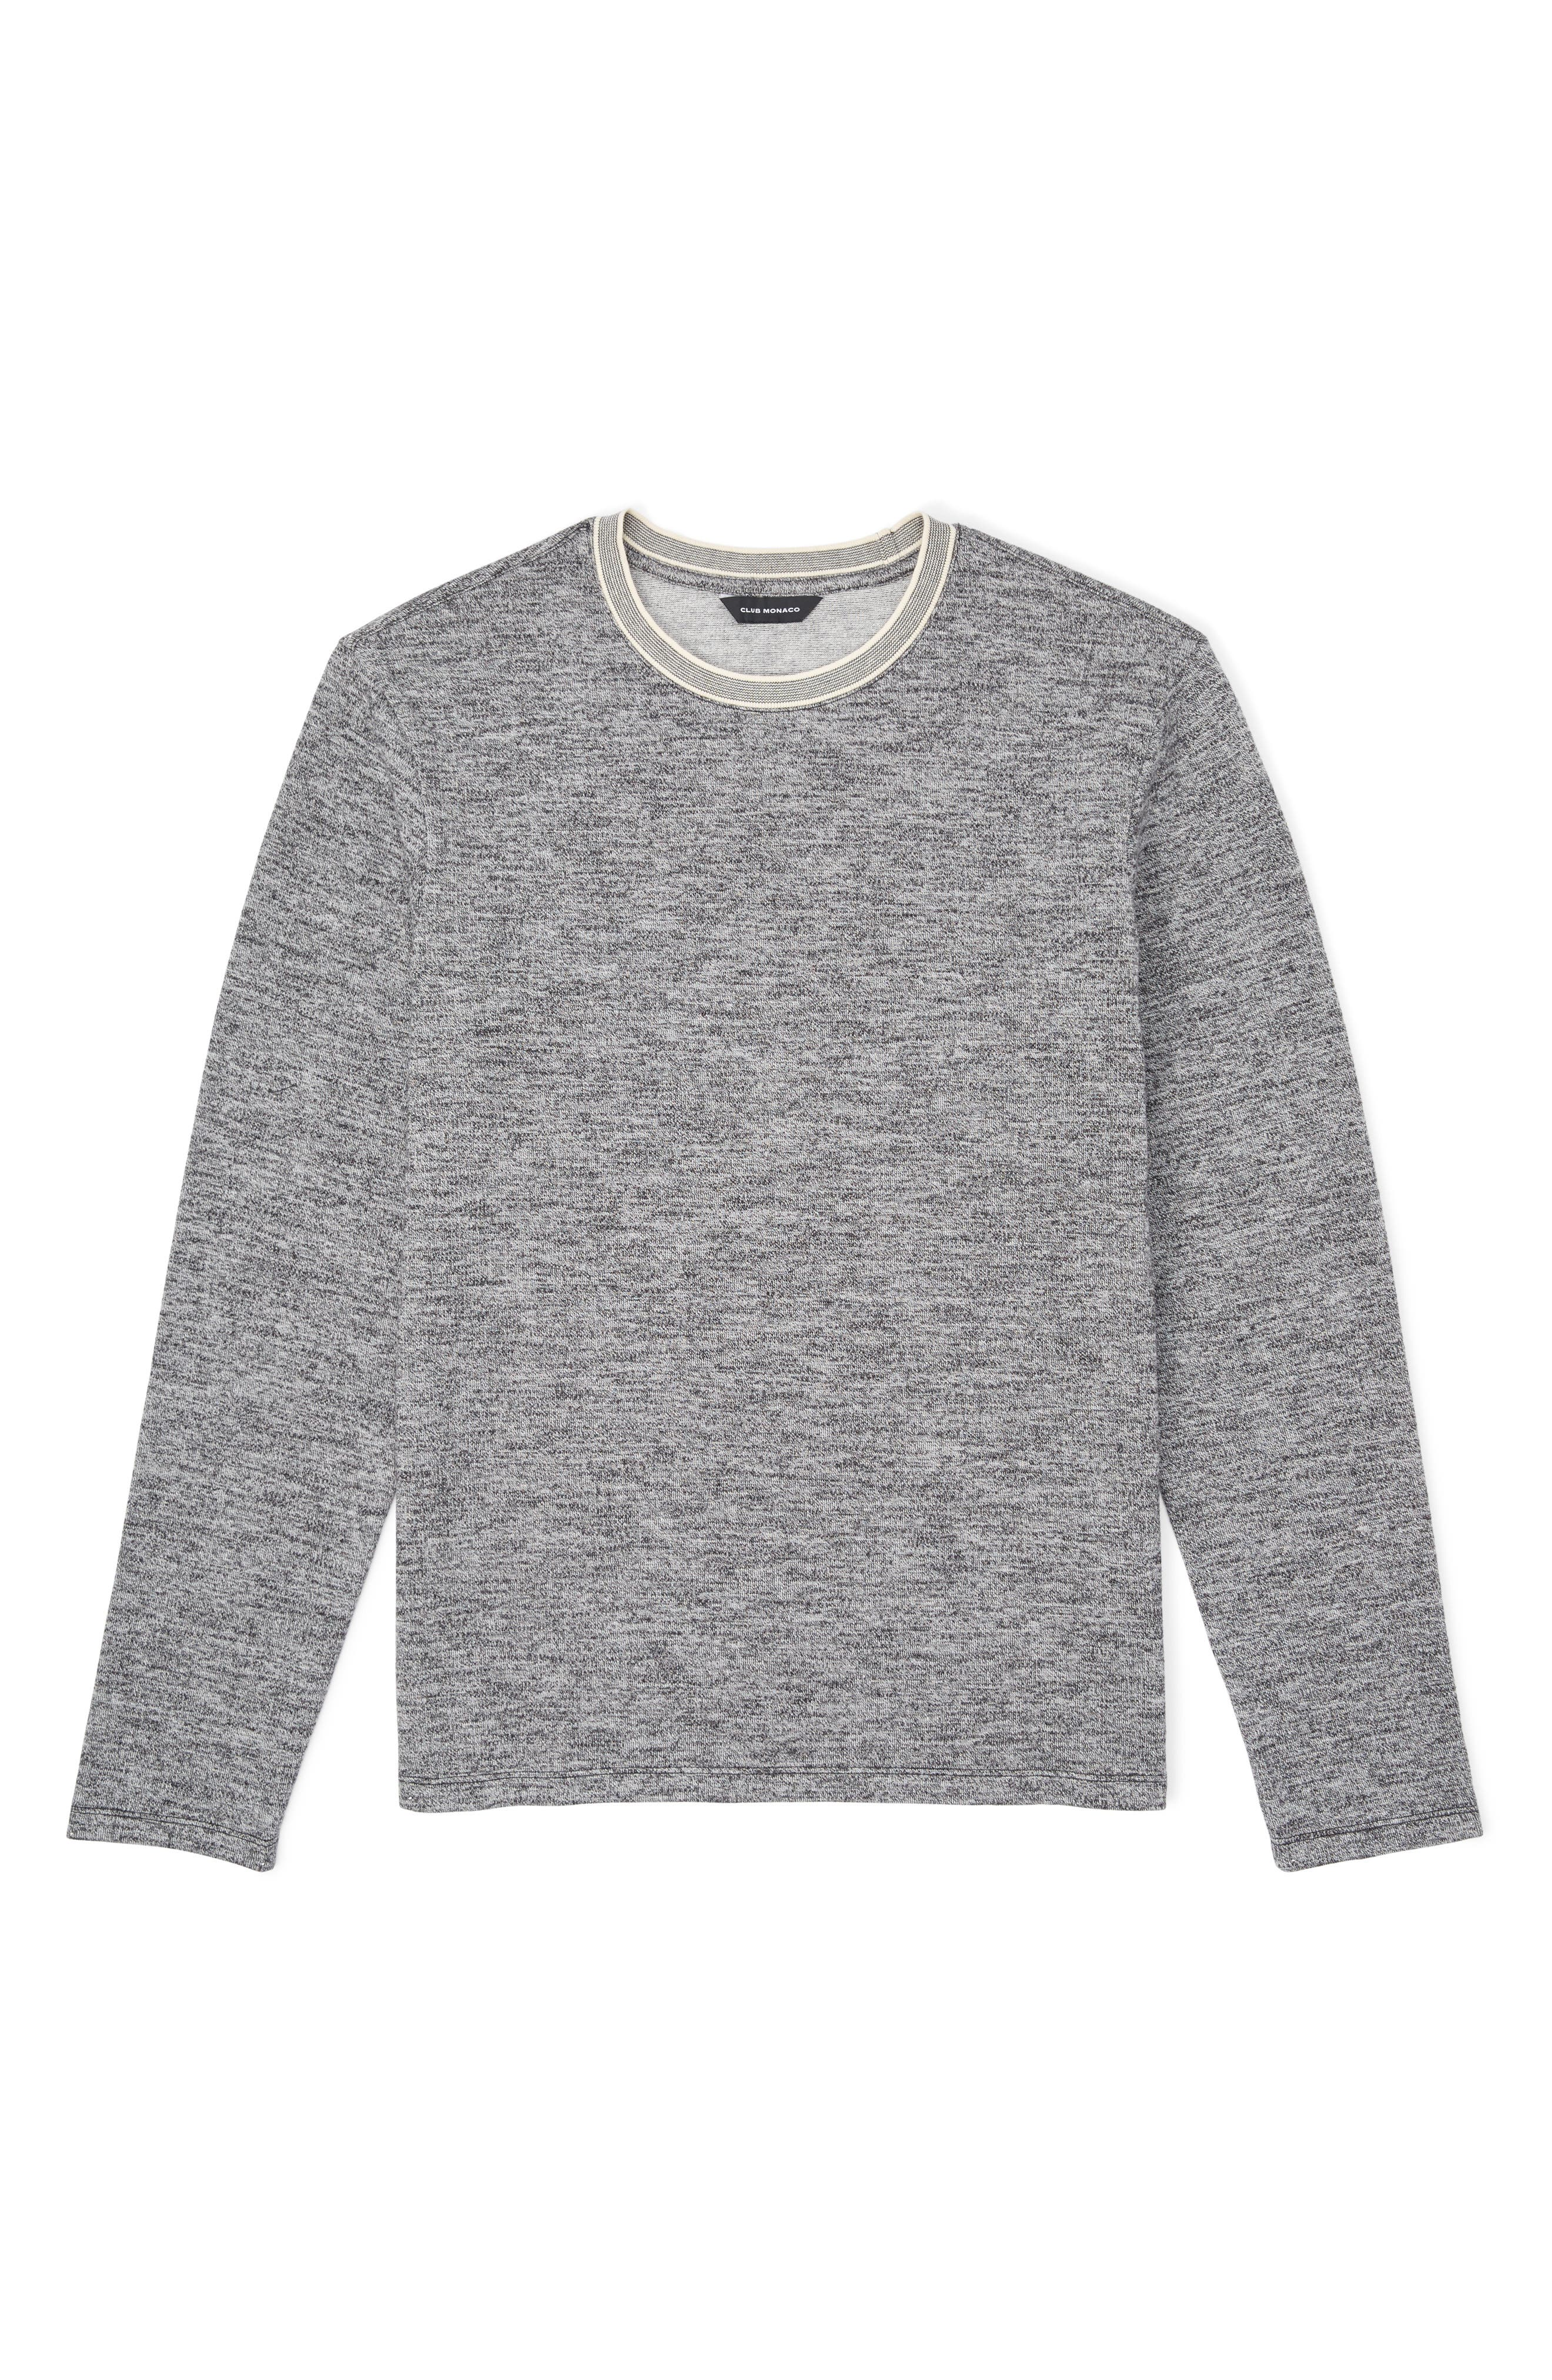 Marled Cotton Crewneck Shirt,                             Alternate thumbnail 3, color,                             CHARCOAL HEATHER